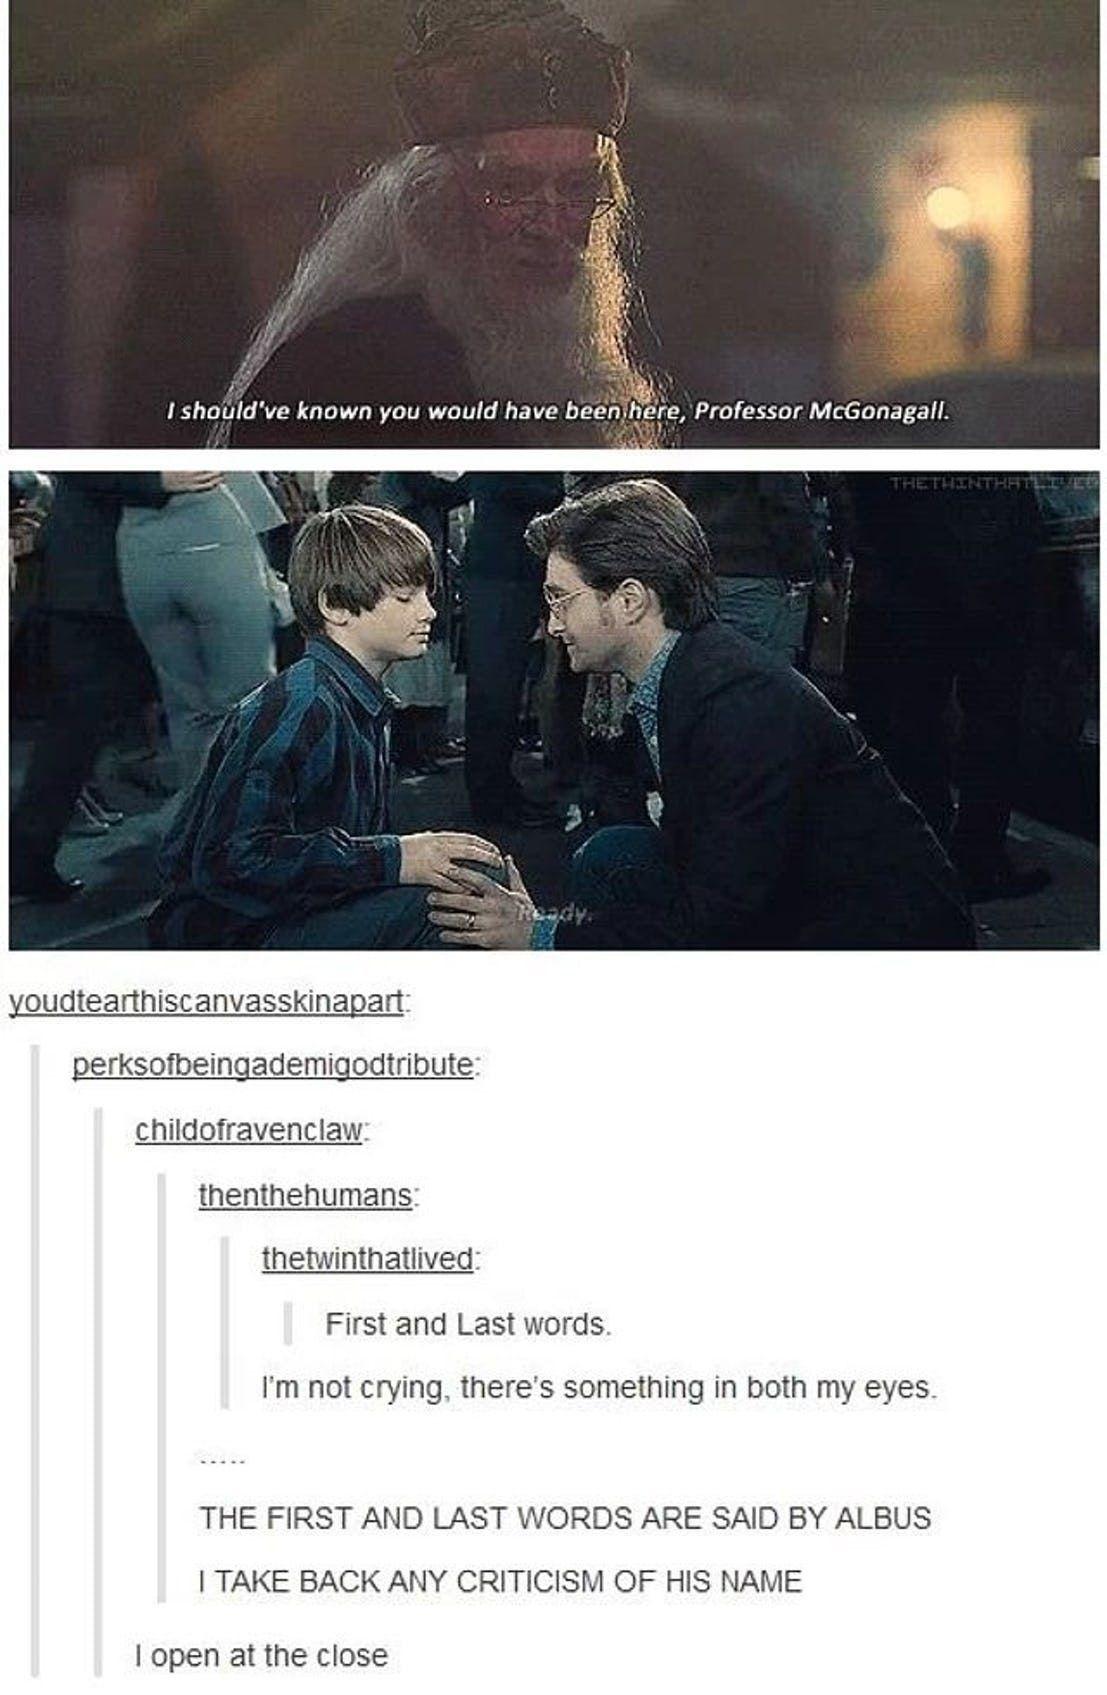 #hp #harrypotter #danielradcliffe #rupertgrint #ronweasley #emmawatson #hermionegranger #fredweasley #georgeweasley #weasley  #lunalovegood  #ginnyweasley #michaelgambon #dumbledore #albusdumbledore #alanrickman #severussnape #remuslupin #moony #marauders #marauders #davidthewlis #garyoldman #padfoot #siriusblack #nevillelongbottom #lilyevans #lilypotter #jamespotter #prongs #voldemort #raphfinnes #bellatrixlestrange #helenabonhamcarter #malfoy #slytherin #gryffindor #ravenclaw #hufflepuff